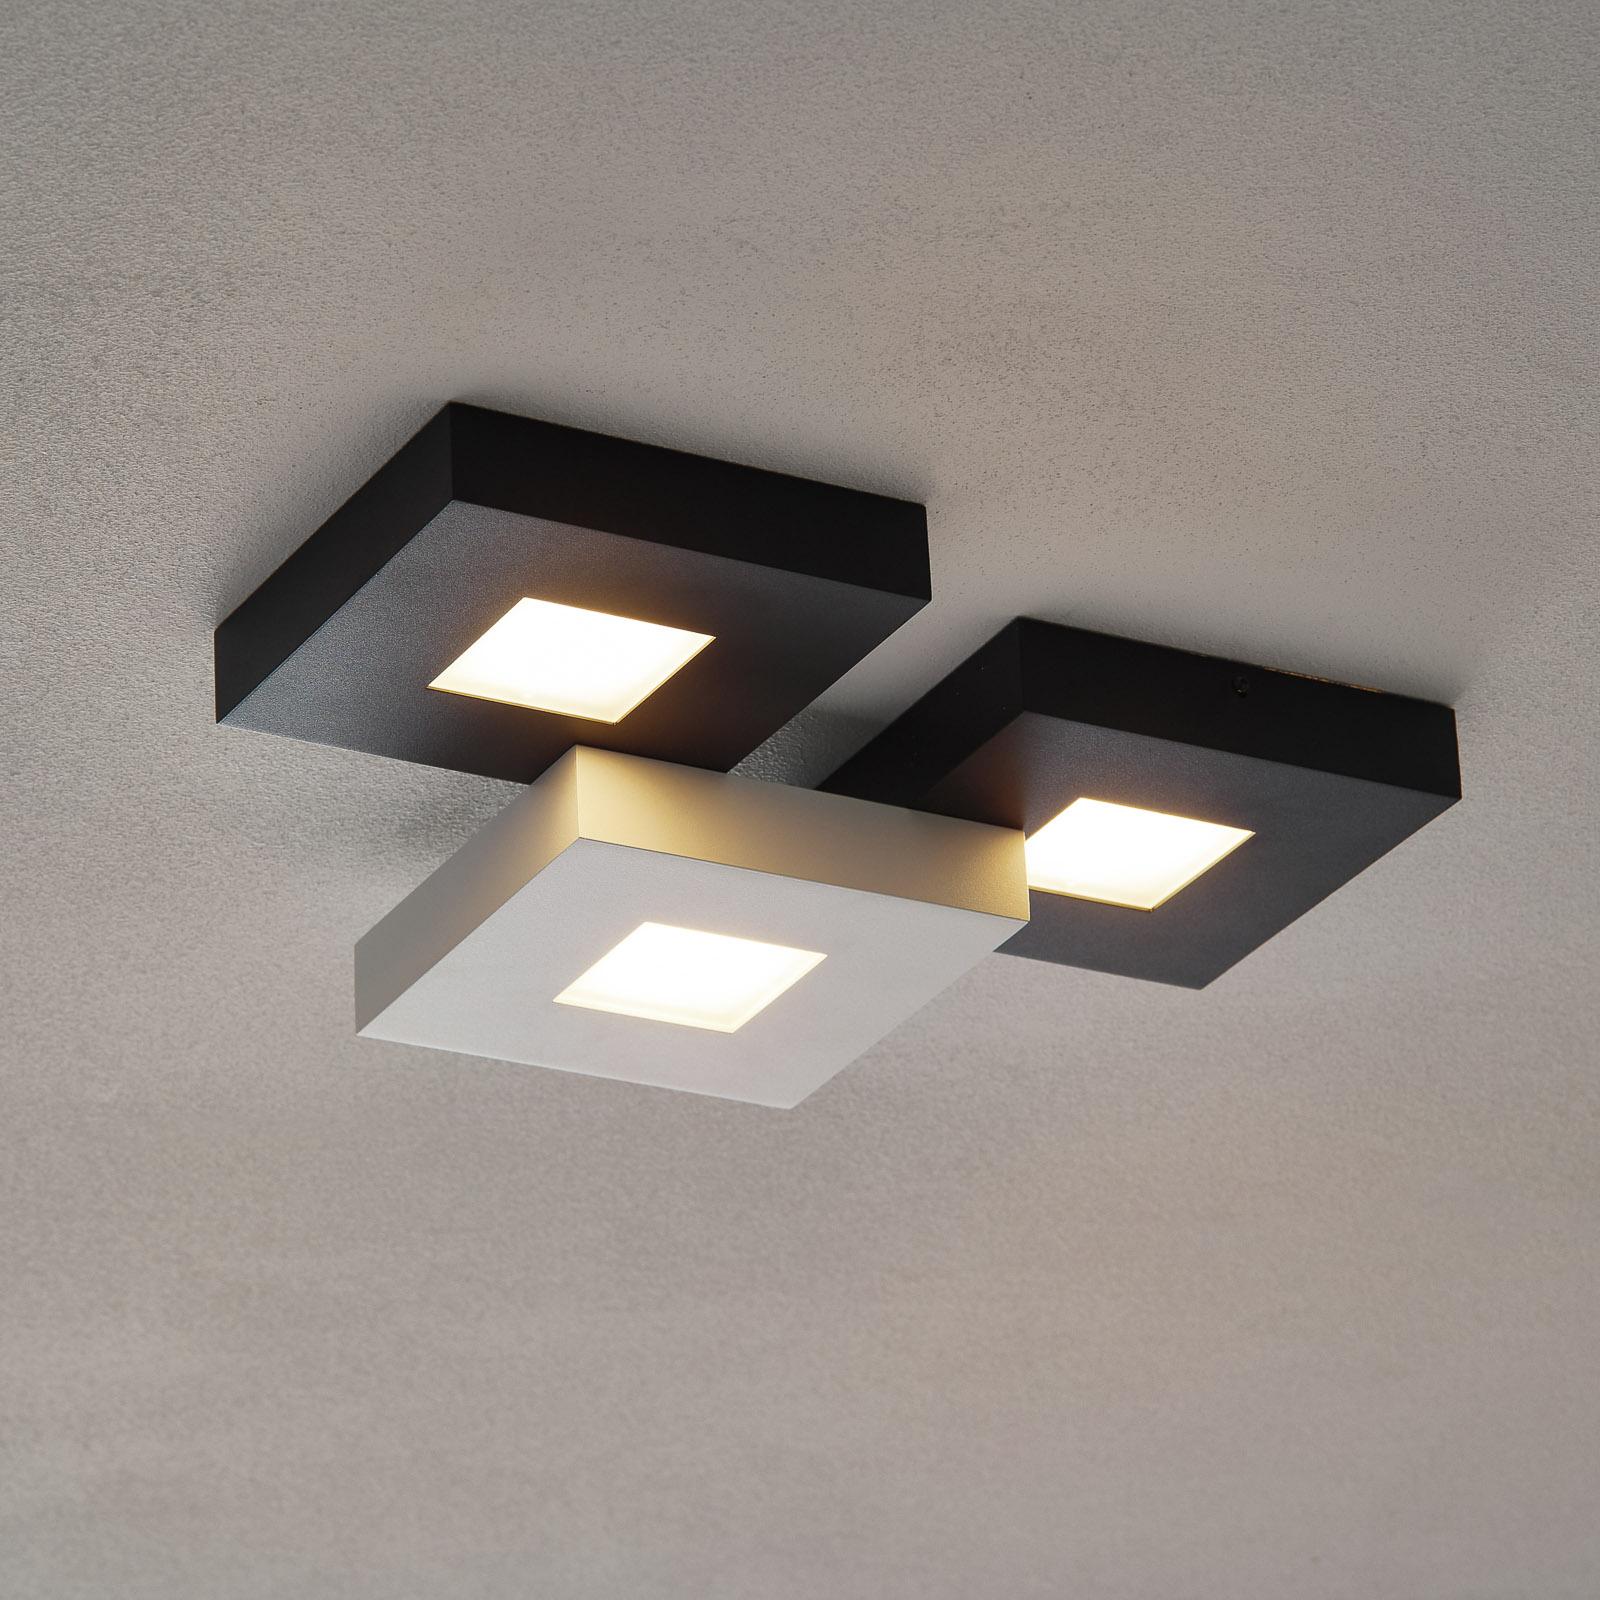 Sort hvid LED-loftslampe Cubus, 3 lyskilder